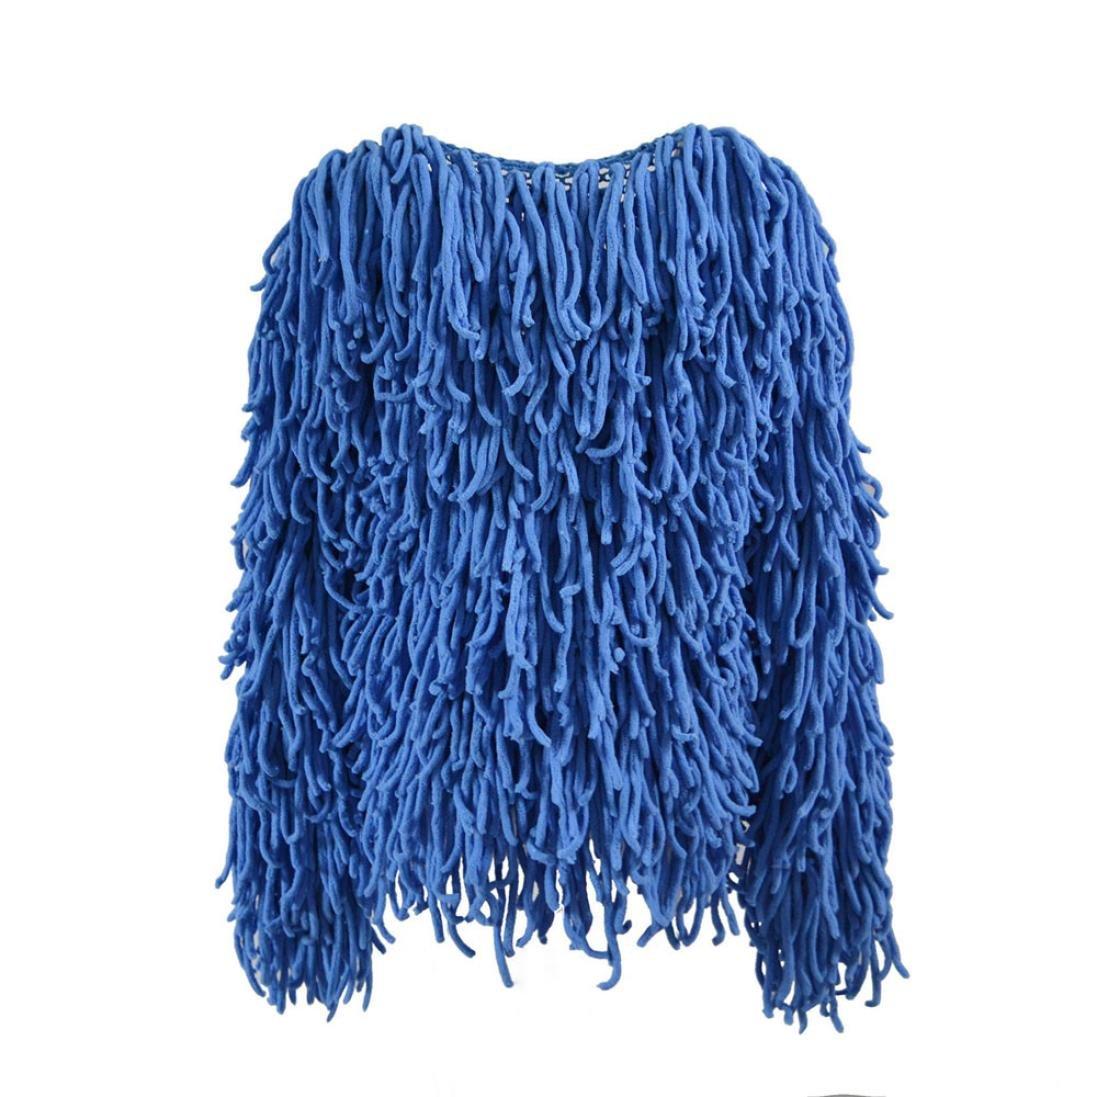 Kanpola Women s Winter Warm Oversized Fur Outwear Chaqueta de Abrigo Peludo Knit Cardigan para Mujer: Amazon.es: Ropa y accesorios